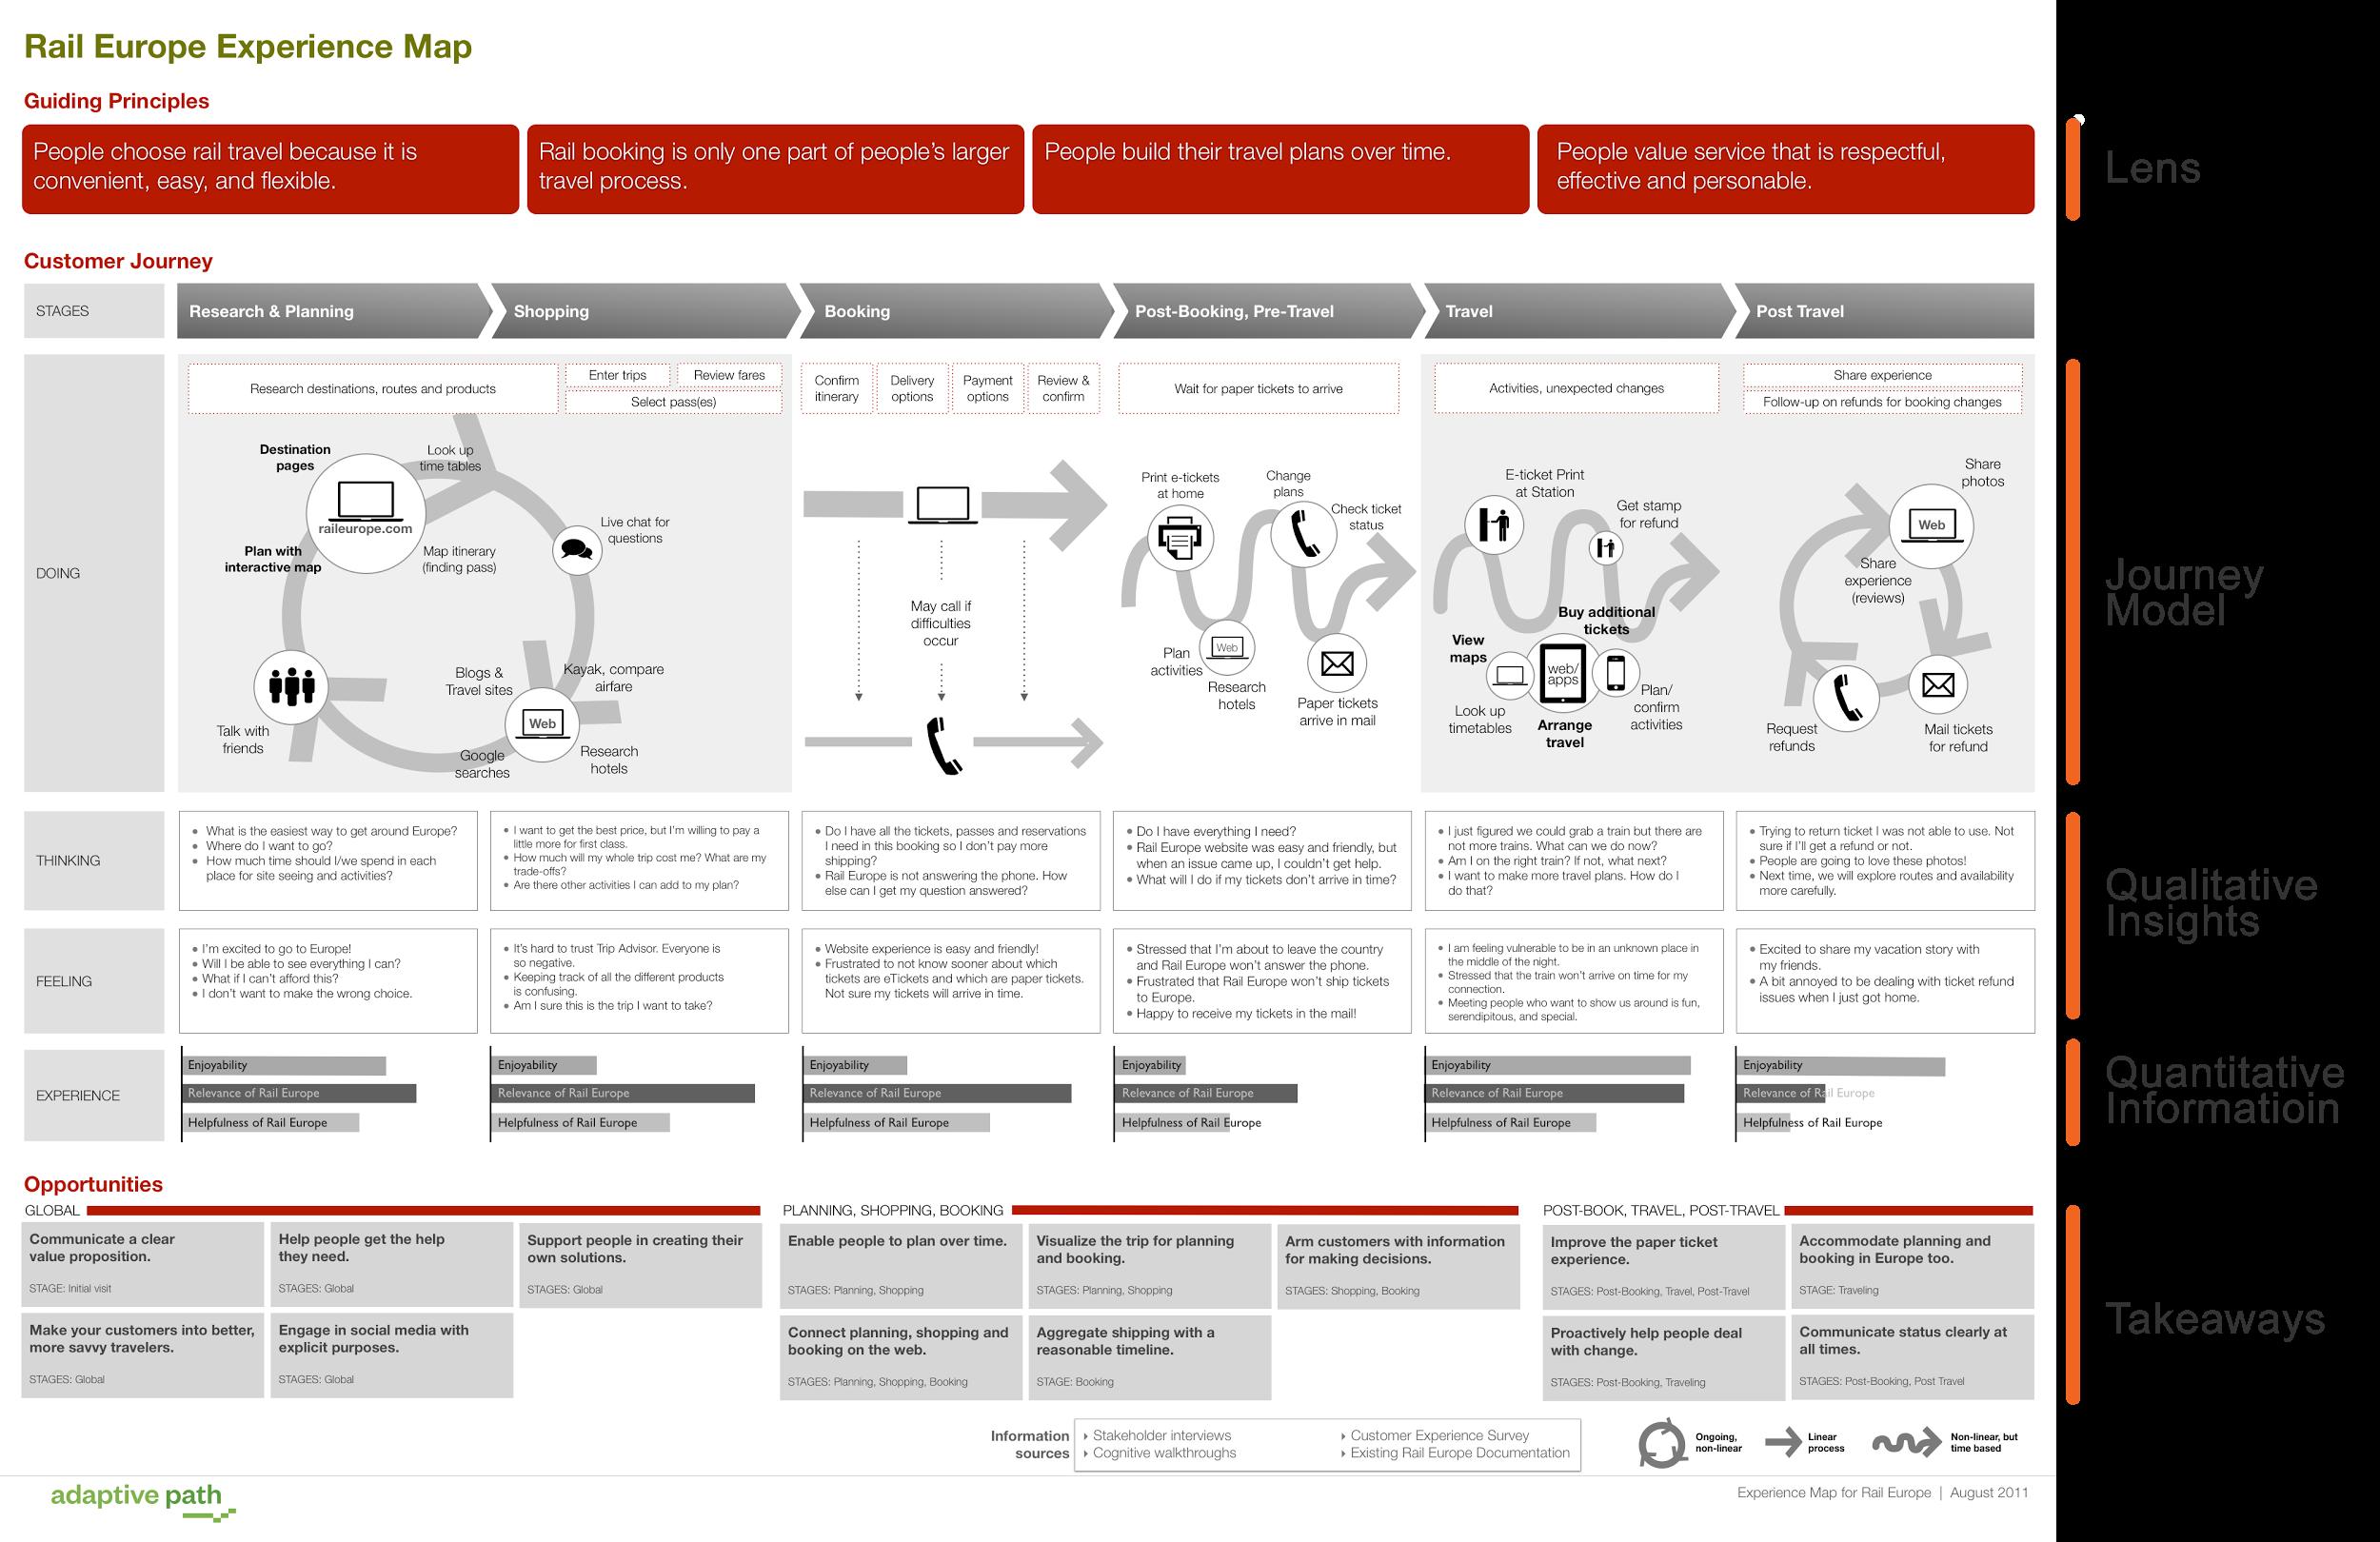 Rail Europe customer journey map